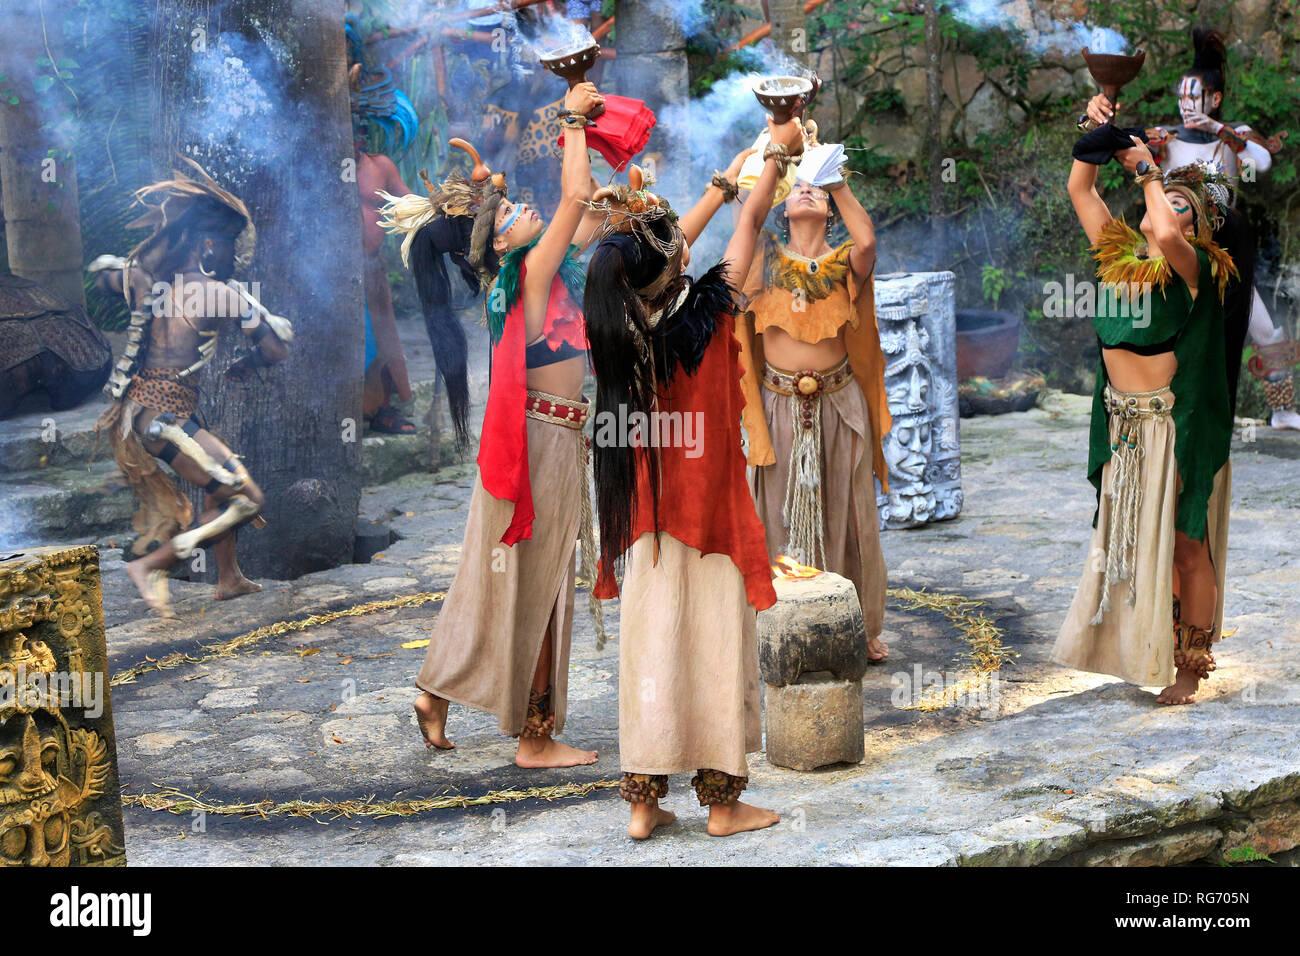 Pre-Hispanic Mayan amerindian people performance into the jungle in the ancient Mayan Village, Riviera Maya, Mexico - Stock Image